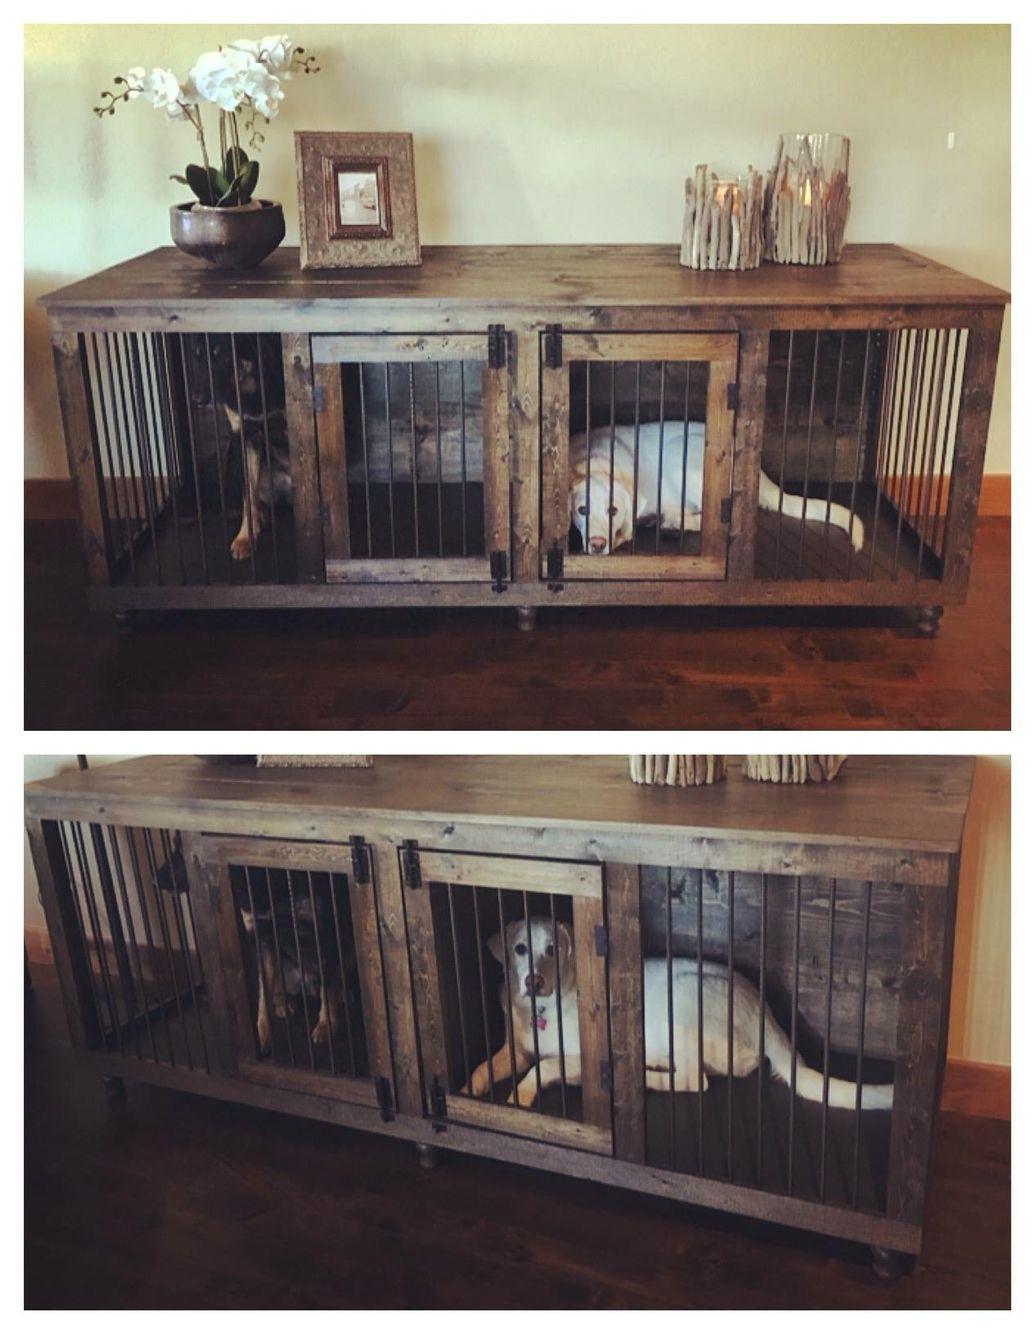 Pin By Bia Anelis On Animal Dog Crate Furniture Crate Furniture